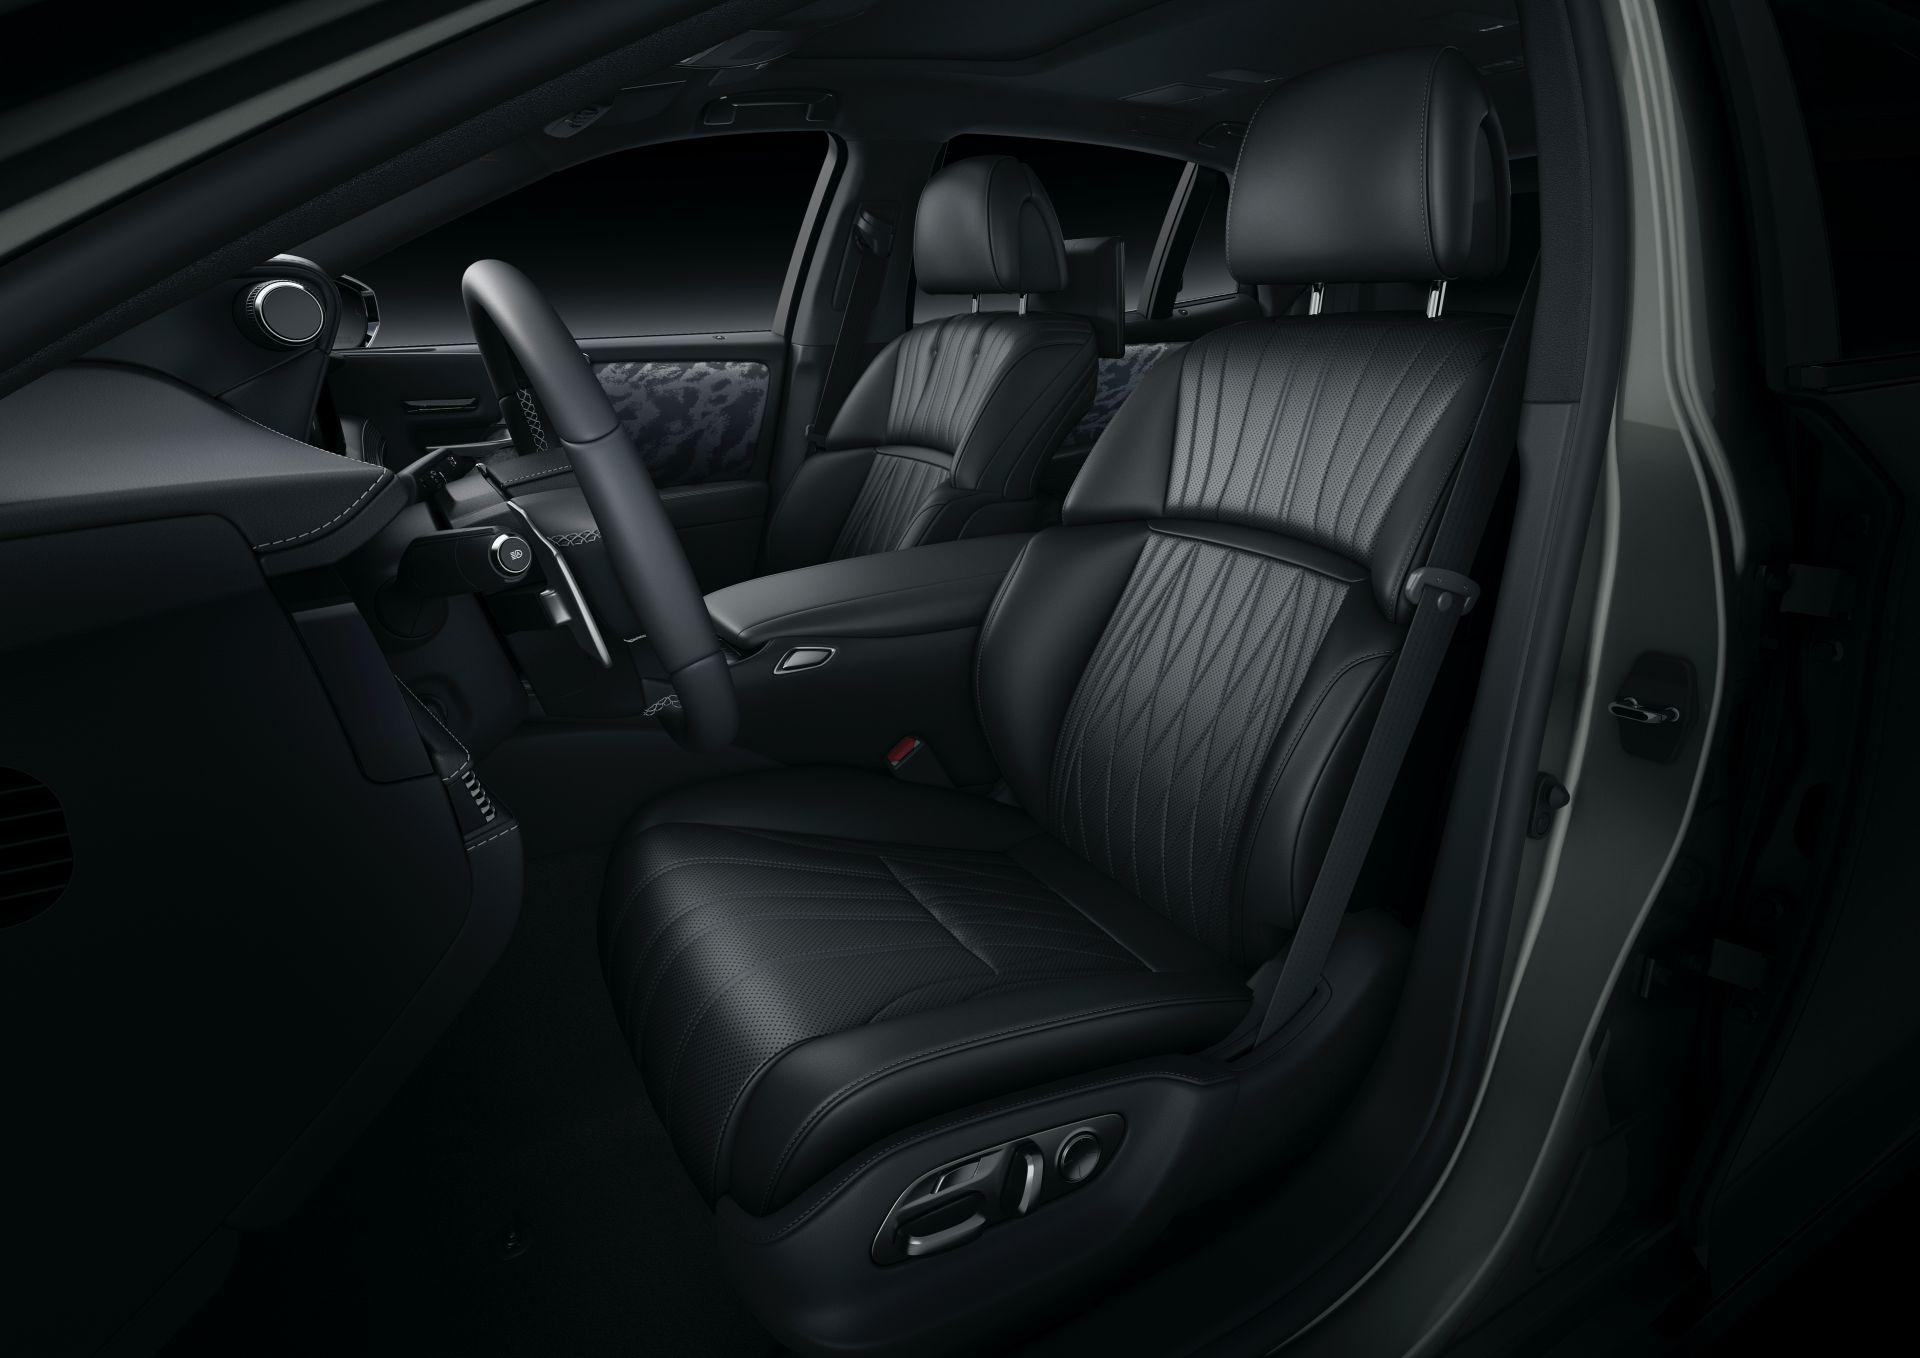 2021-lexus-ls-facelift-22.jpg